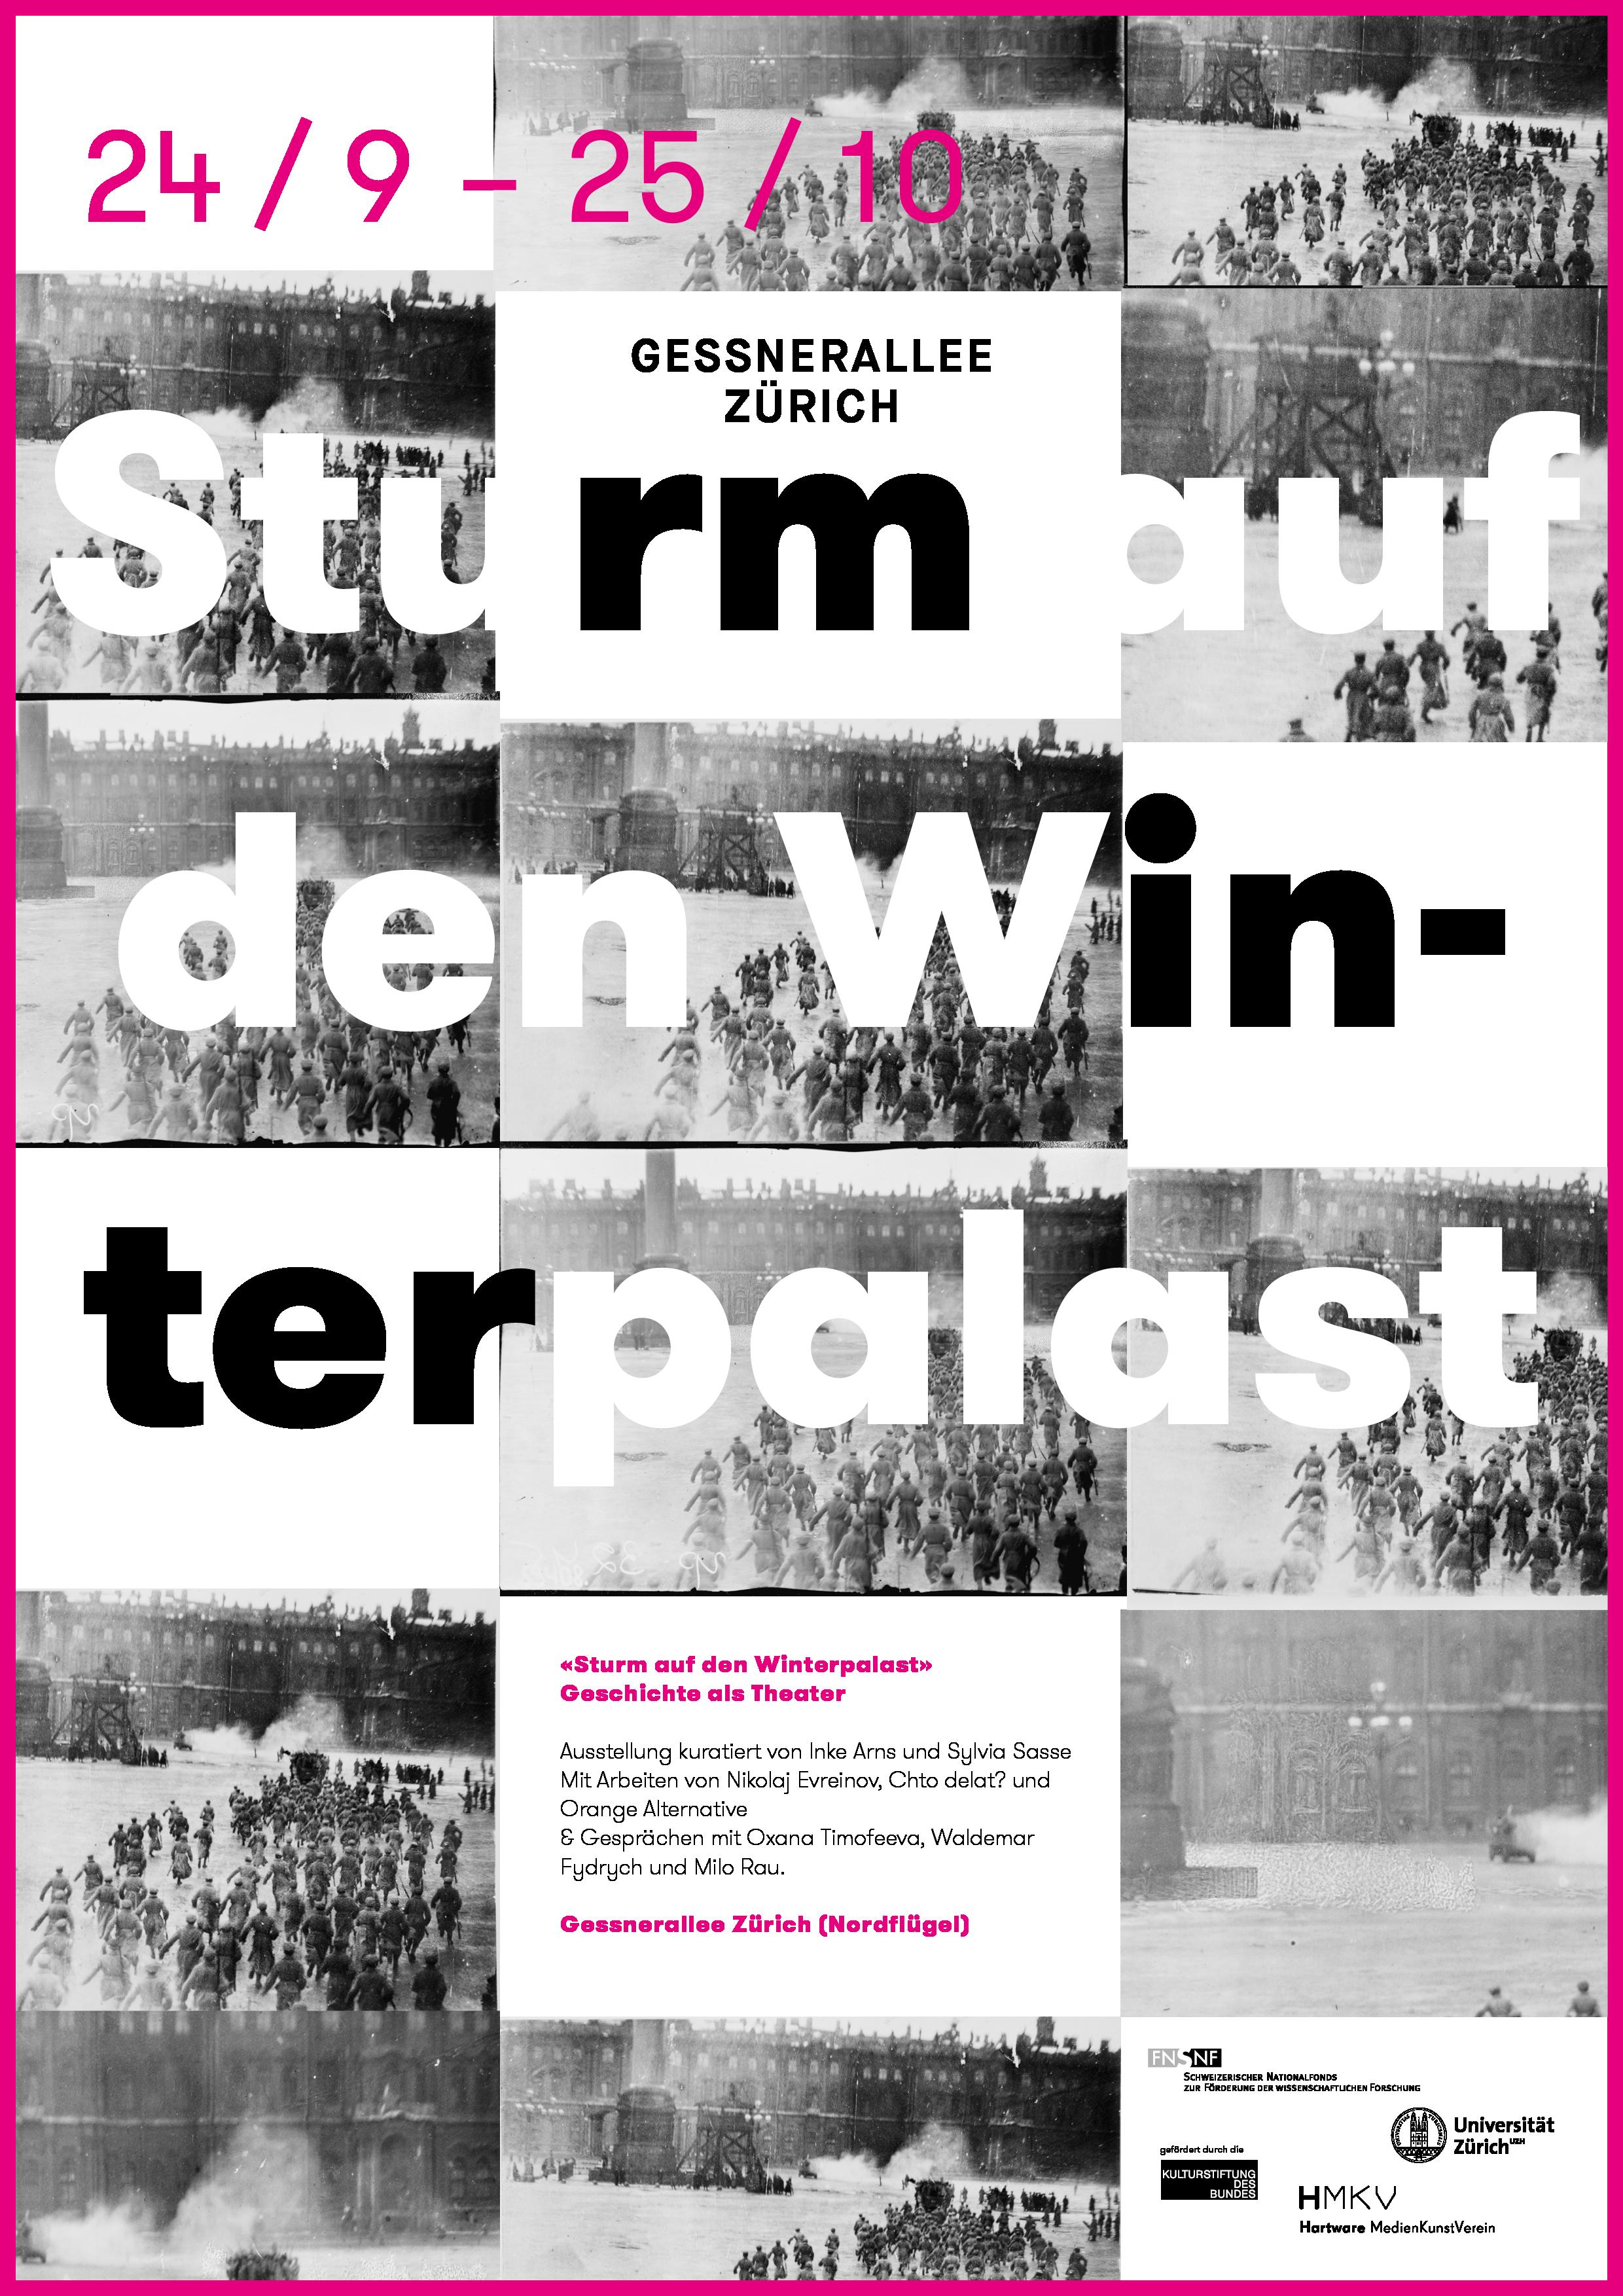 170814_Sturmauf_RZ_DruckvorstufePlakatF4_sw_II